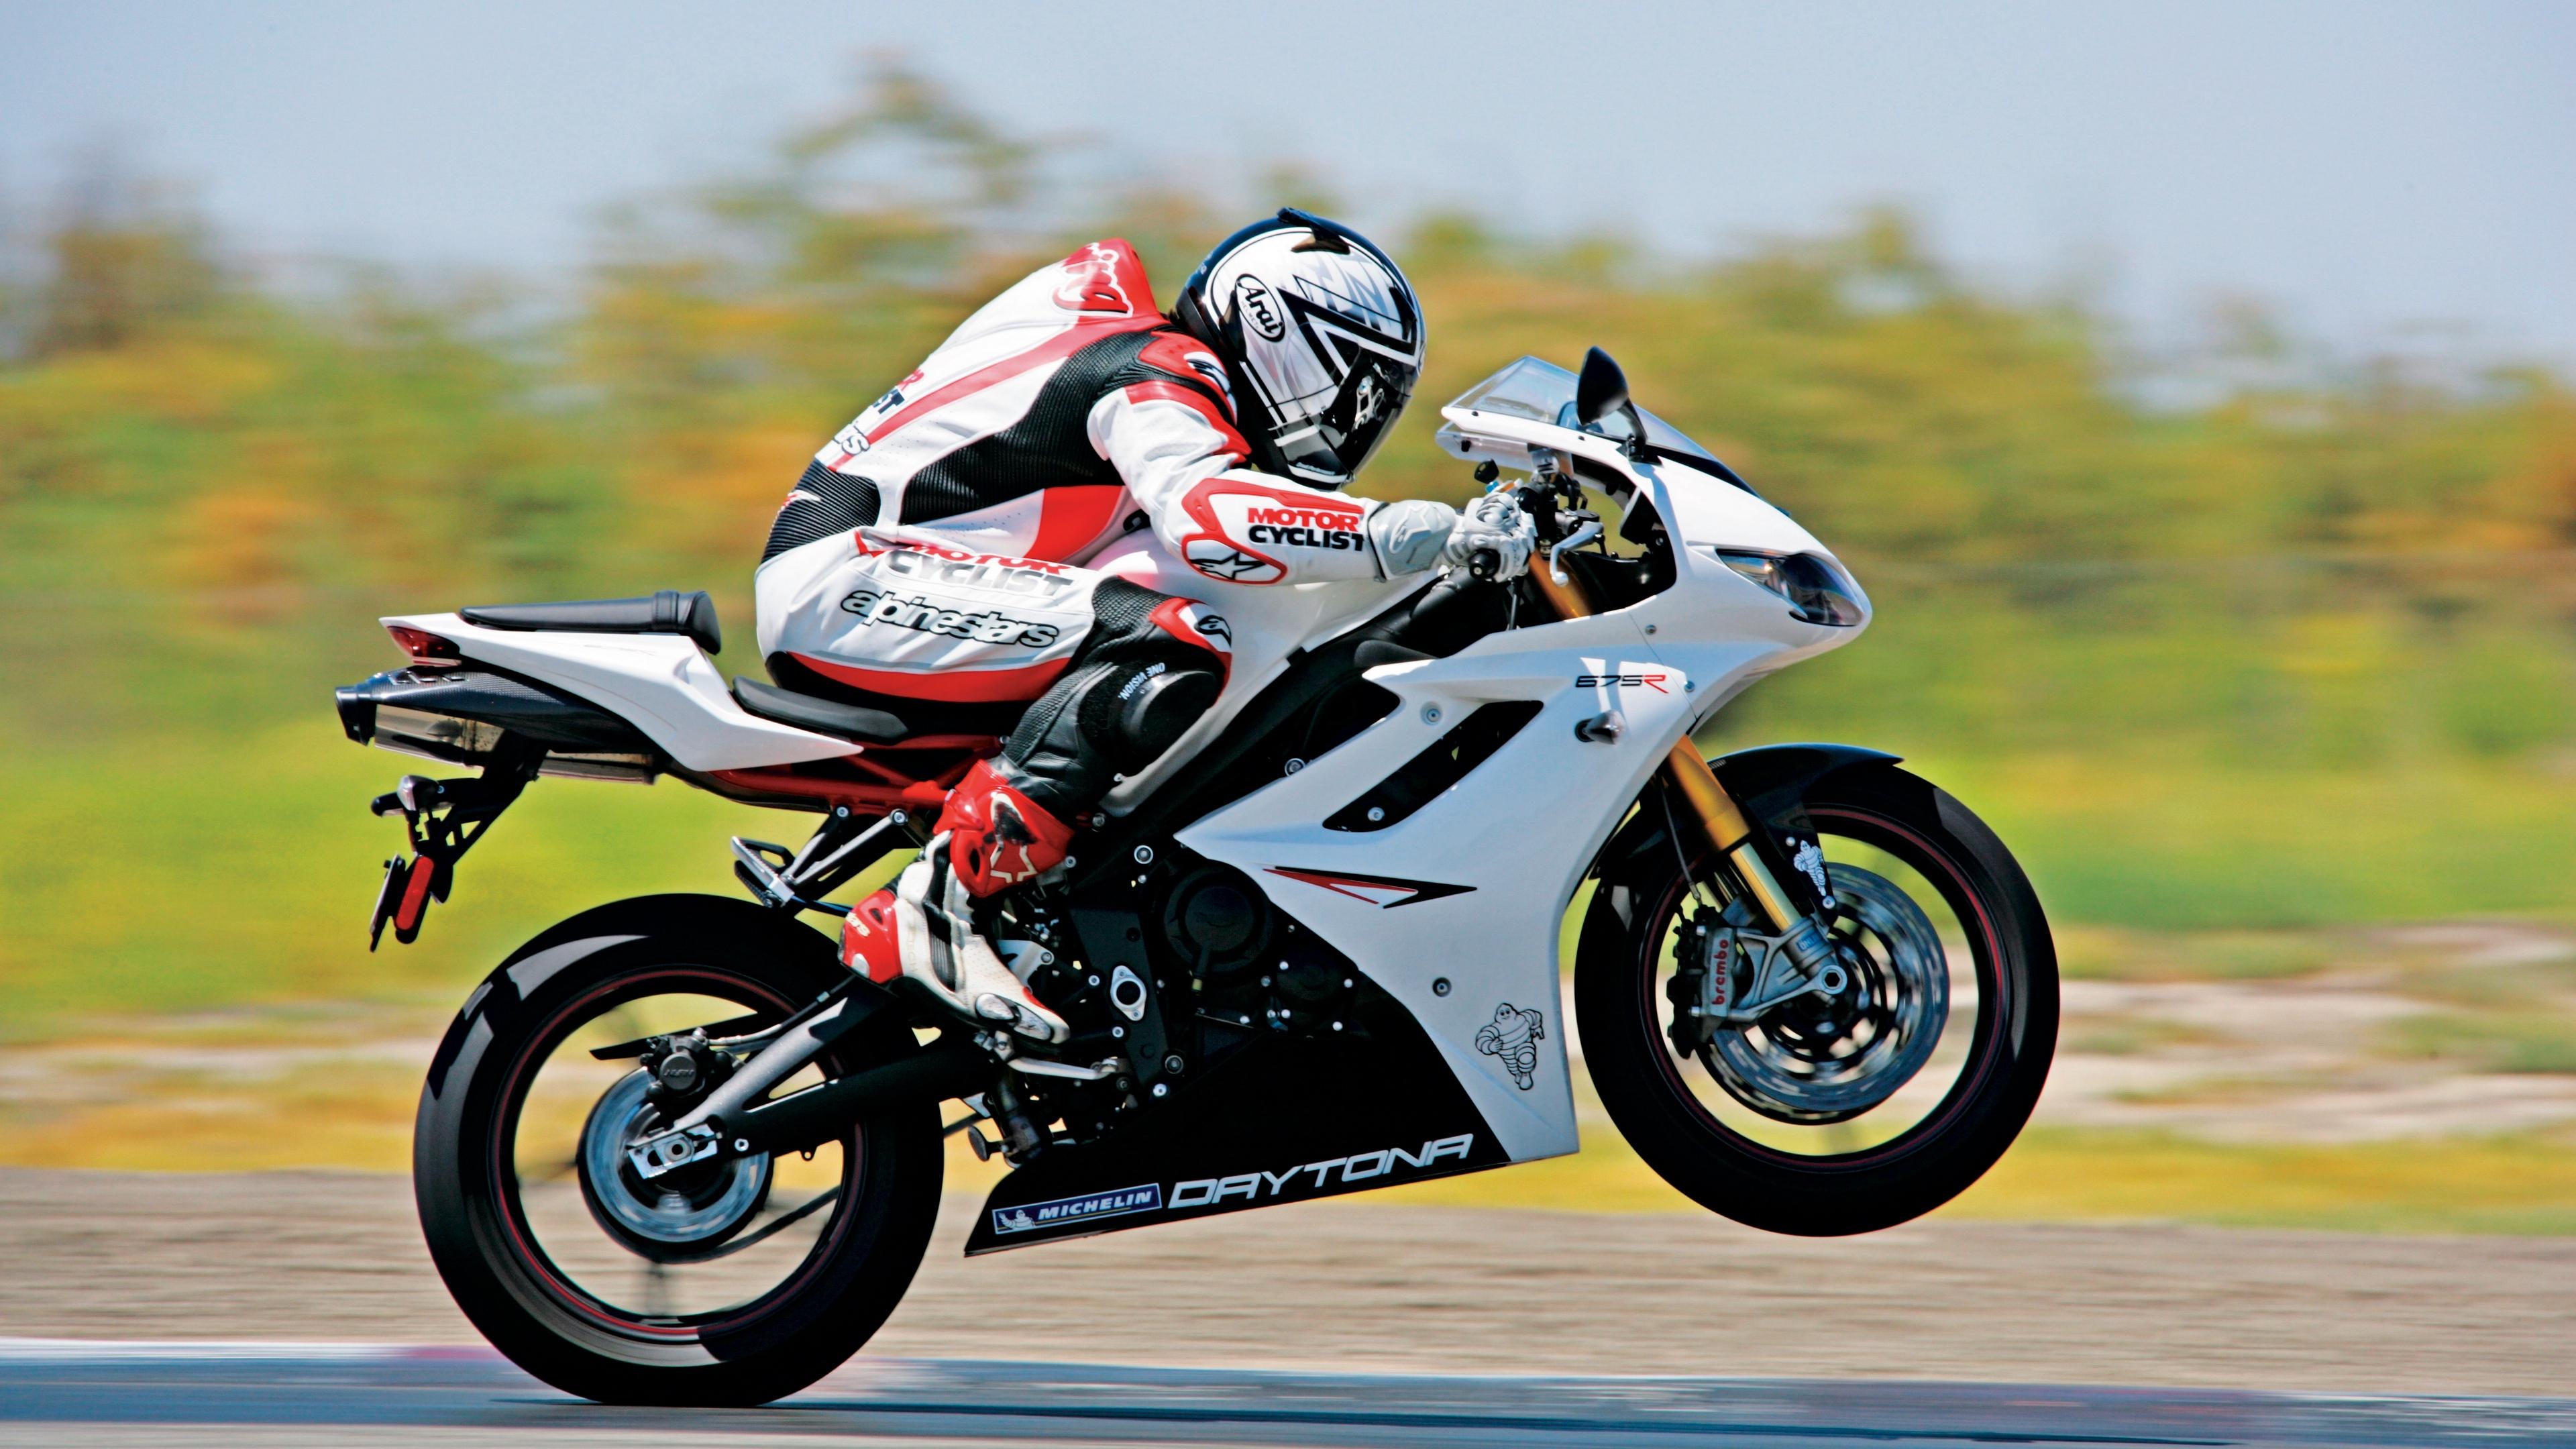 motorcyclist bike motorcycle speed 4k 1536018852 - motorcyclist, bike, motorcycle, speed 4k - motorcyclist, Motorcycle, Bike